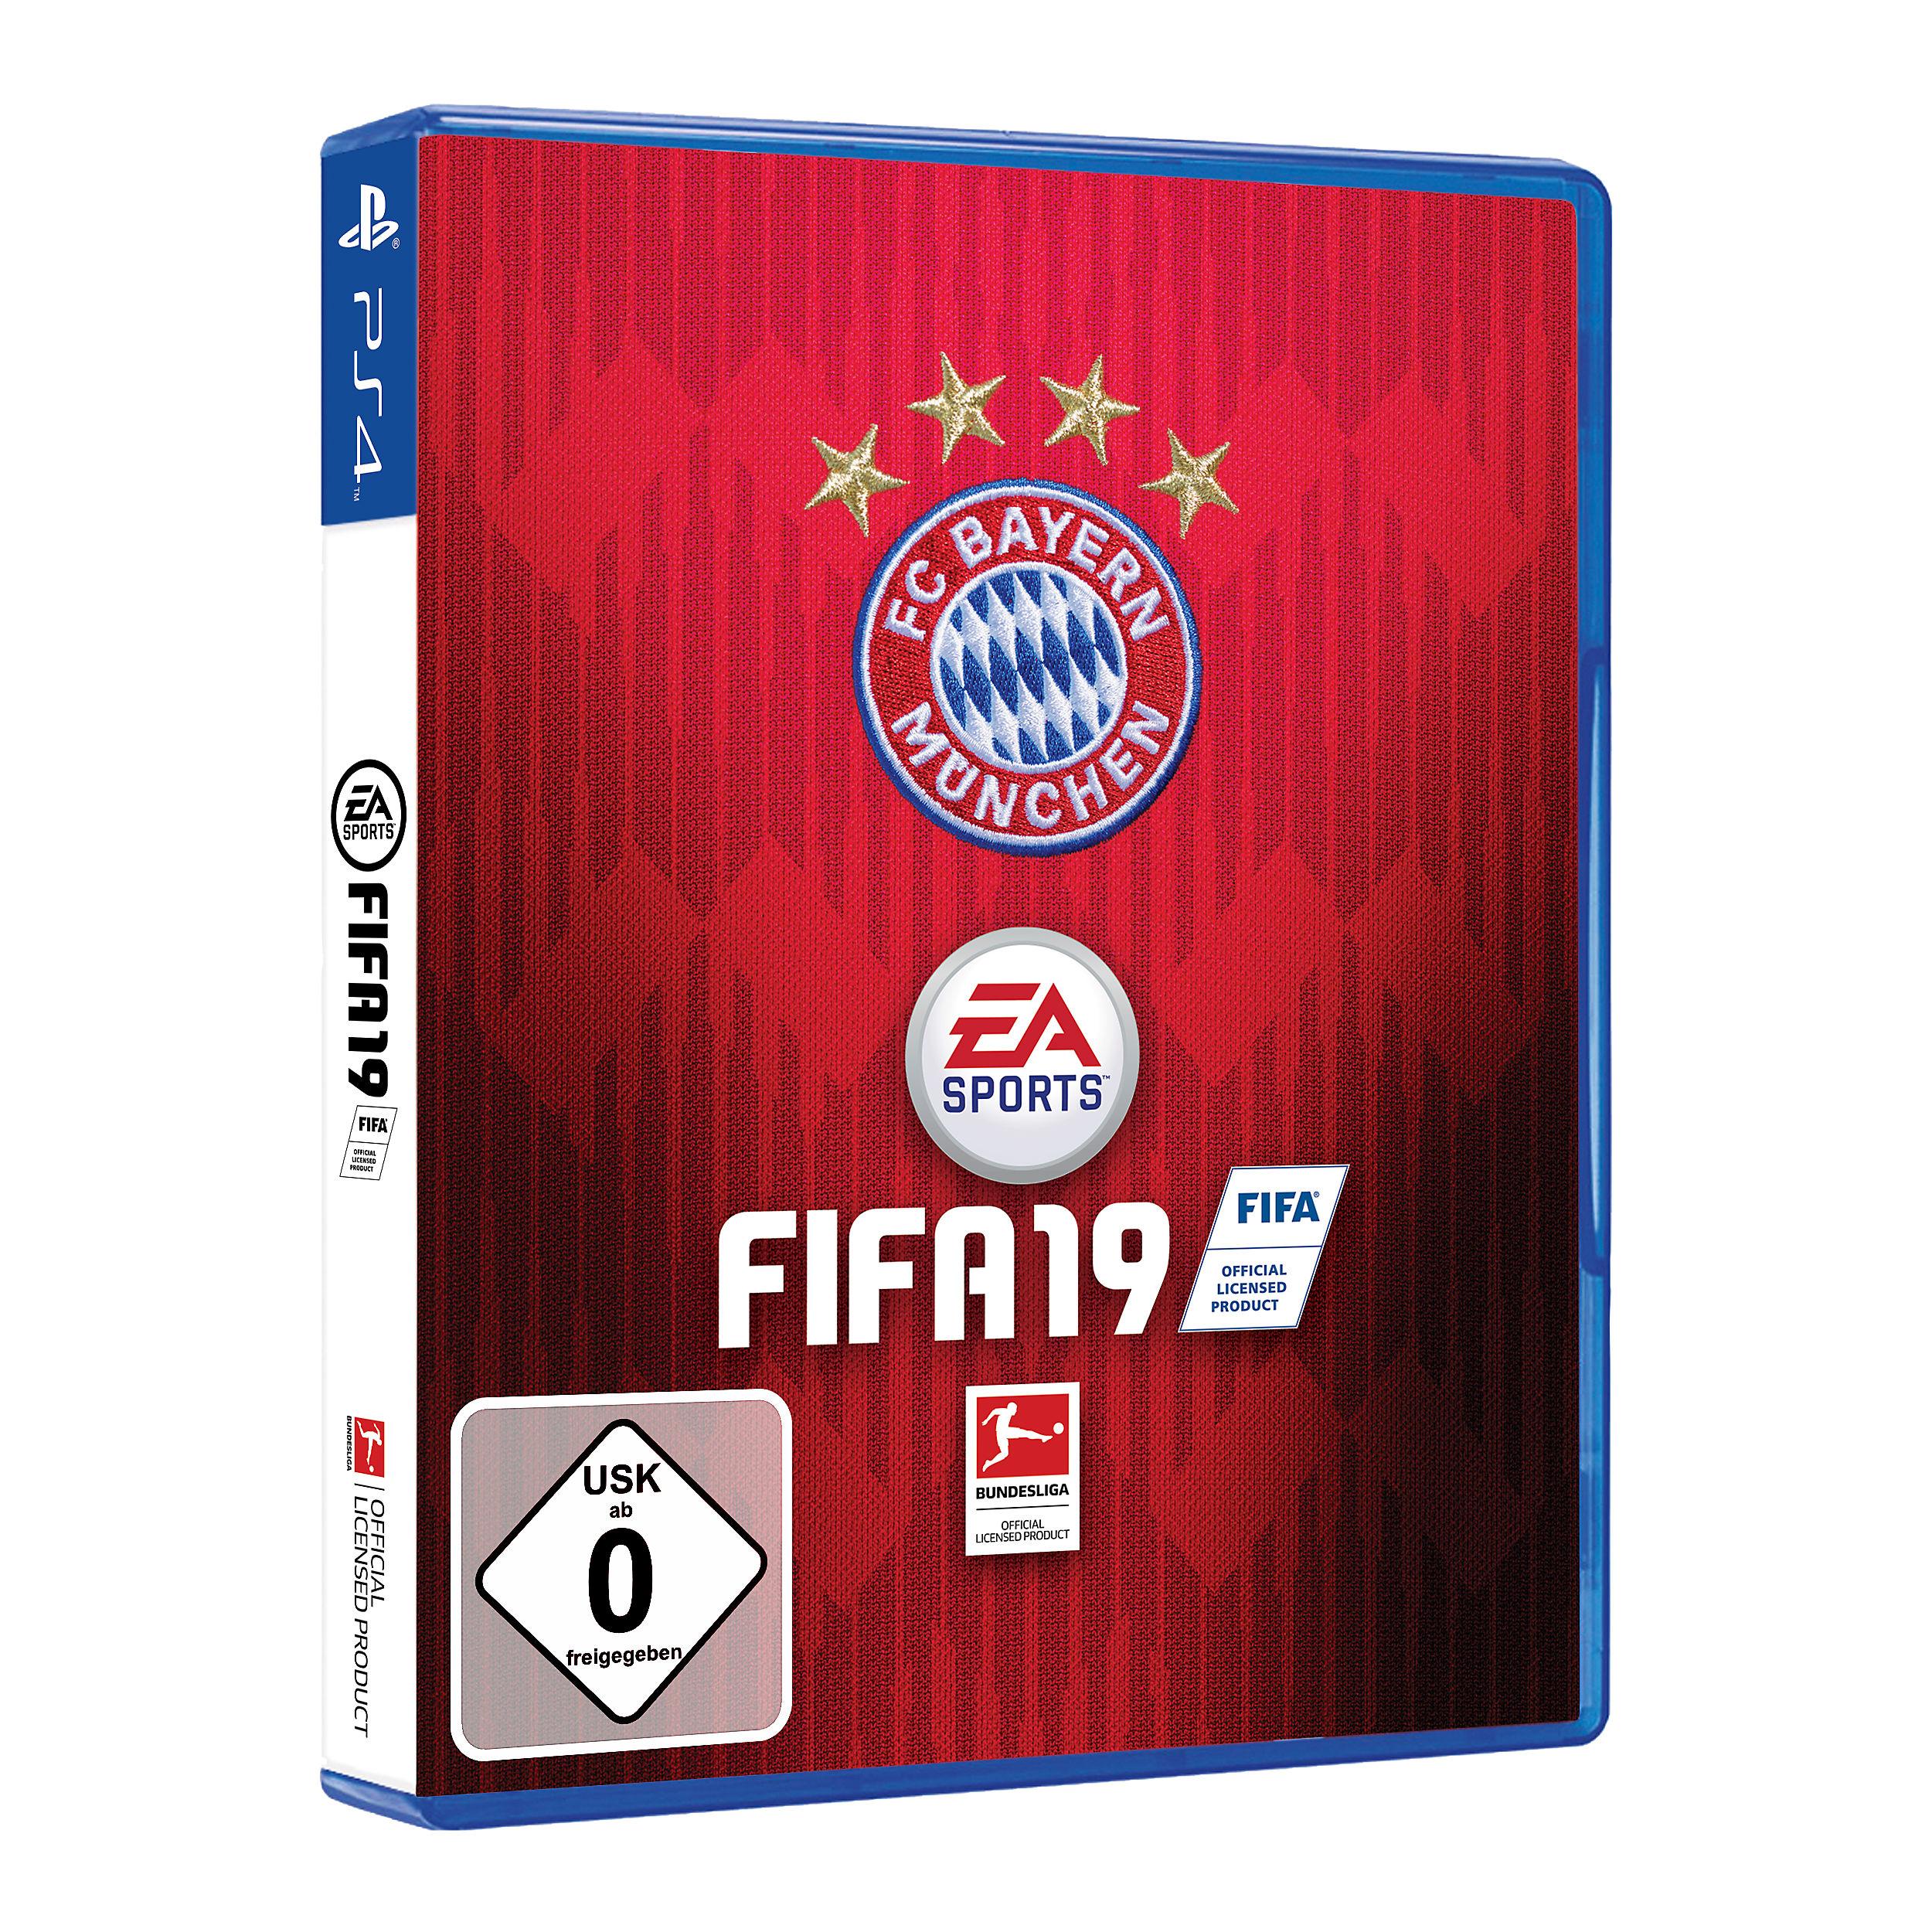 FIFA 19 FC Bayern Edition für PS4 – €69,95